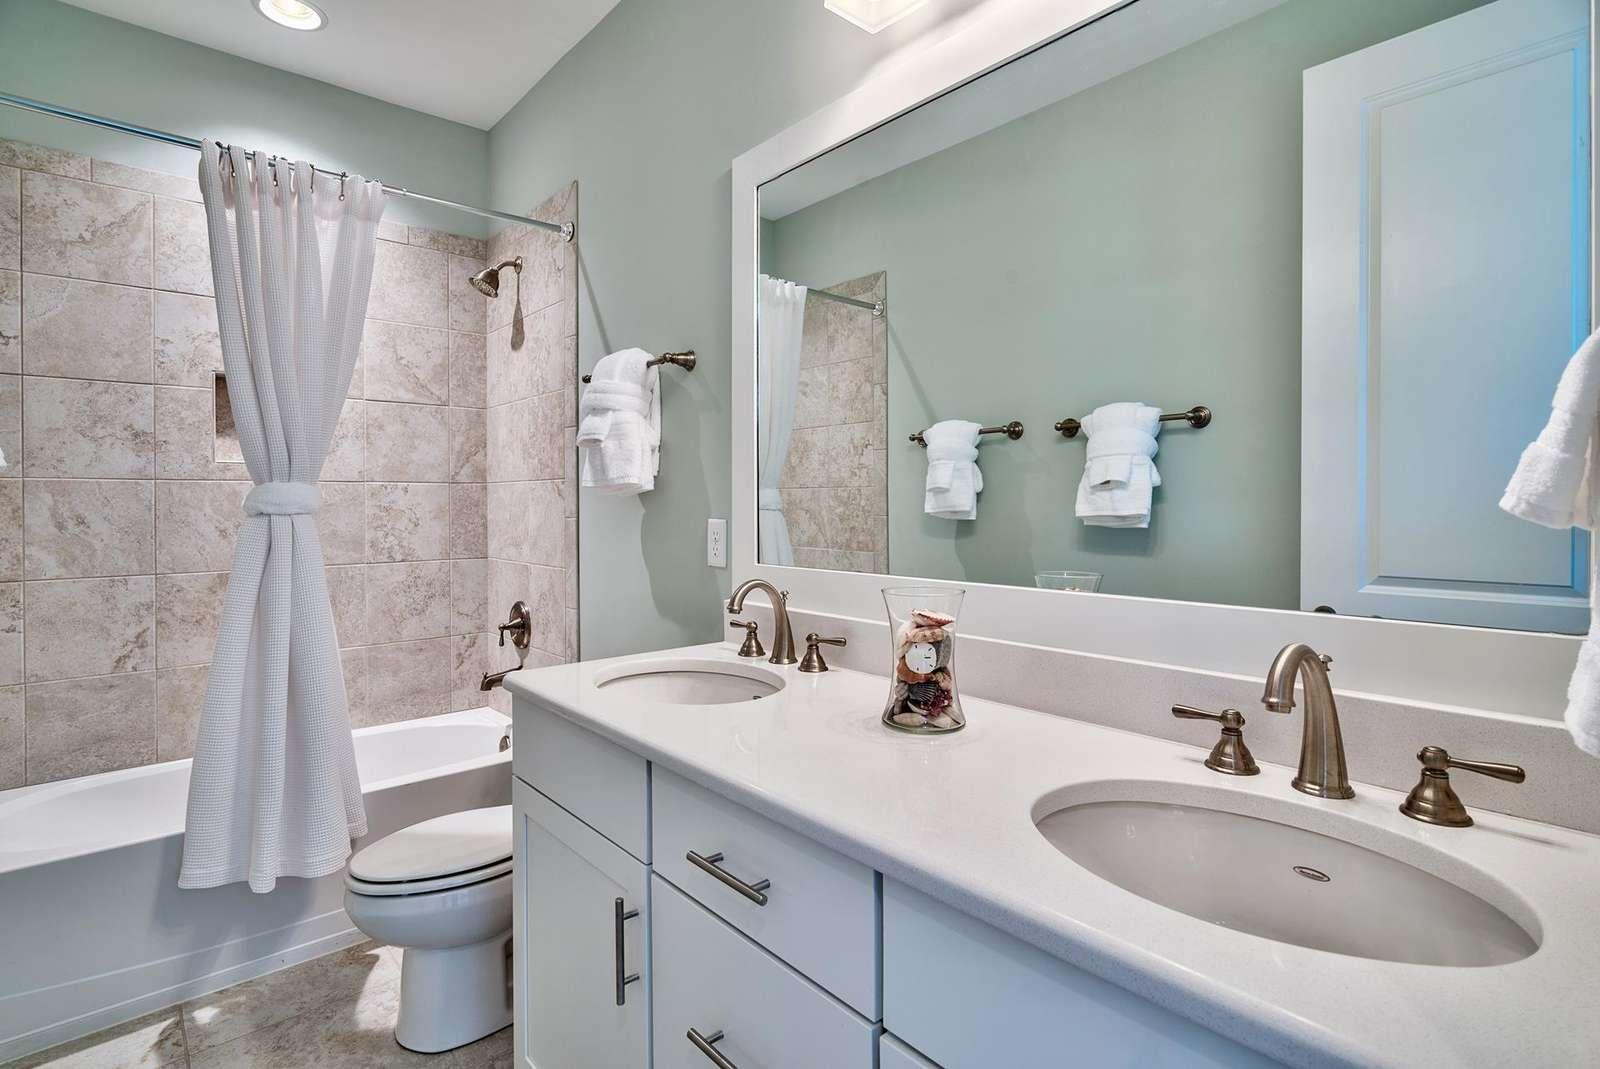 queen & bunk room bath